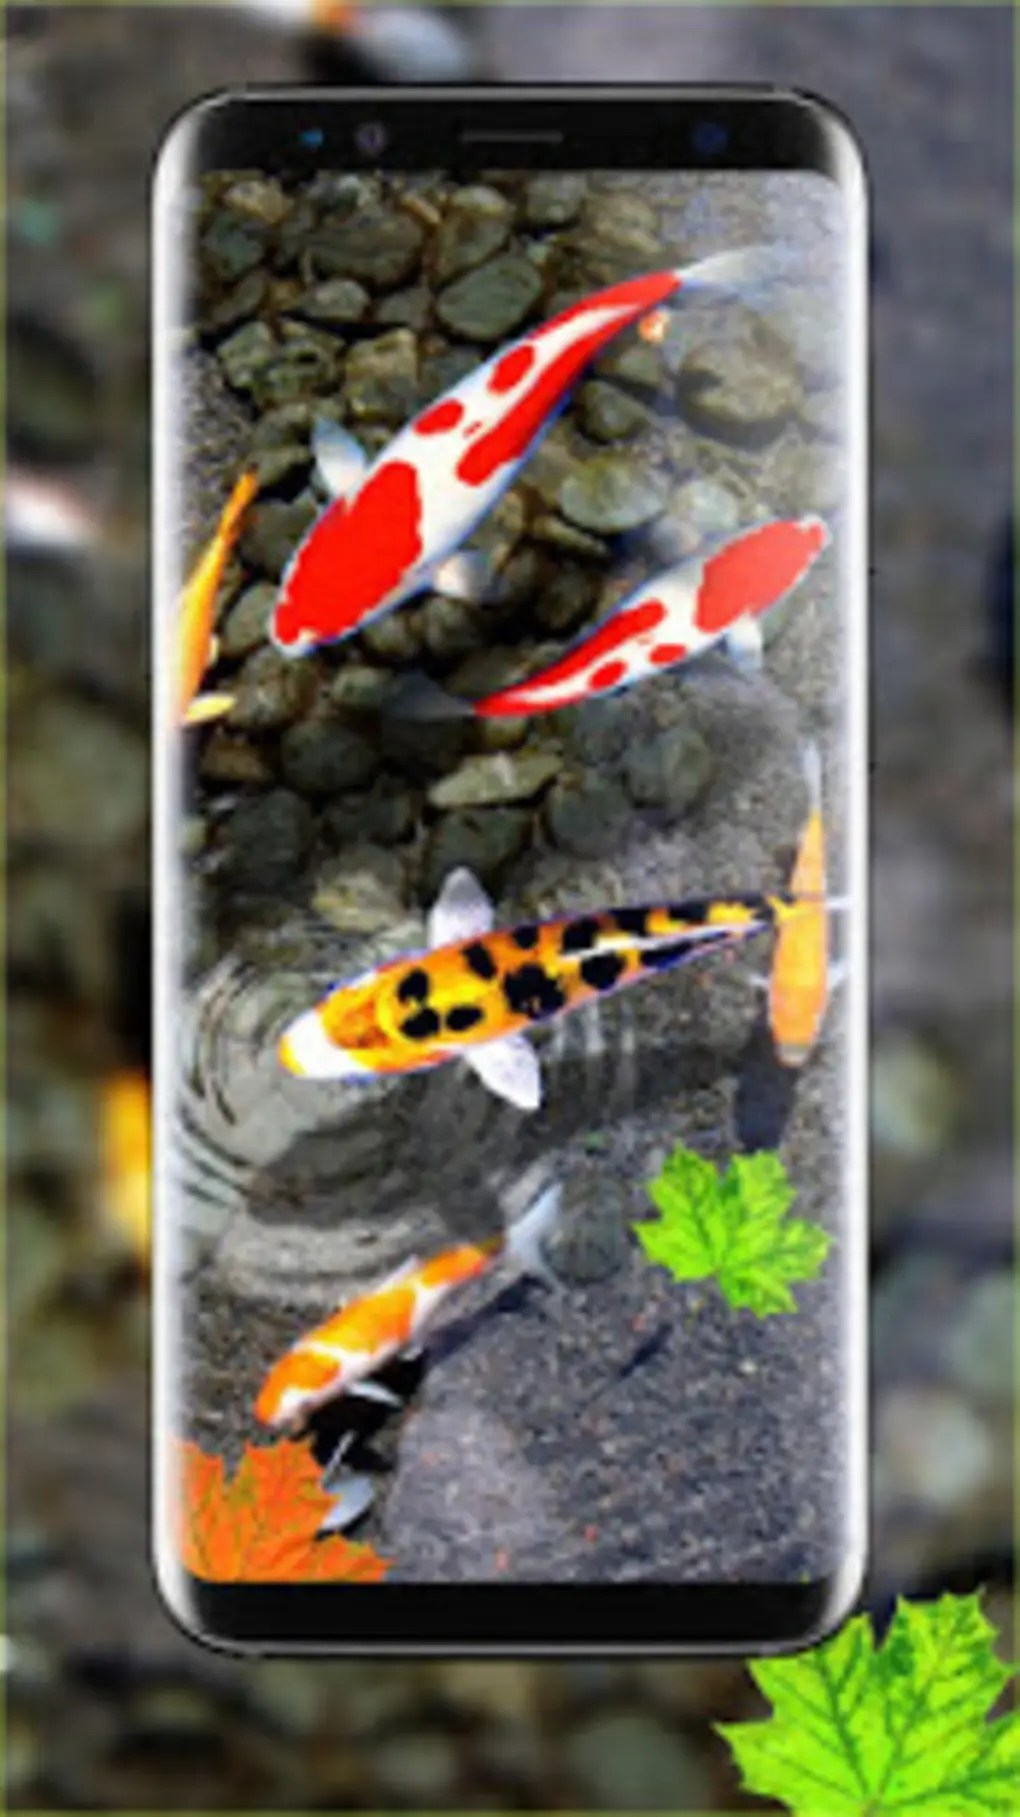 Ritzy You May Like Koi Fish Wallpaper Hd Fish Live Wallpapers Android Download Koi Fish Wallpaper Tumblr Koi Fish Wallpaper Desk houzz-03 Koi Fish Wallpaper